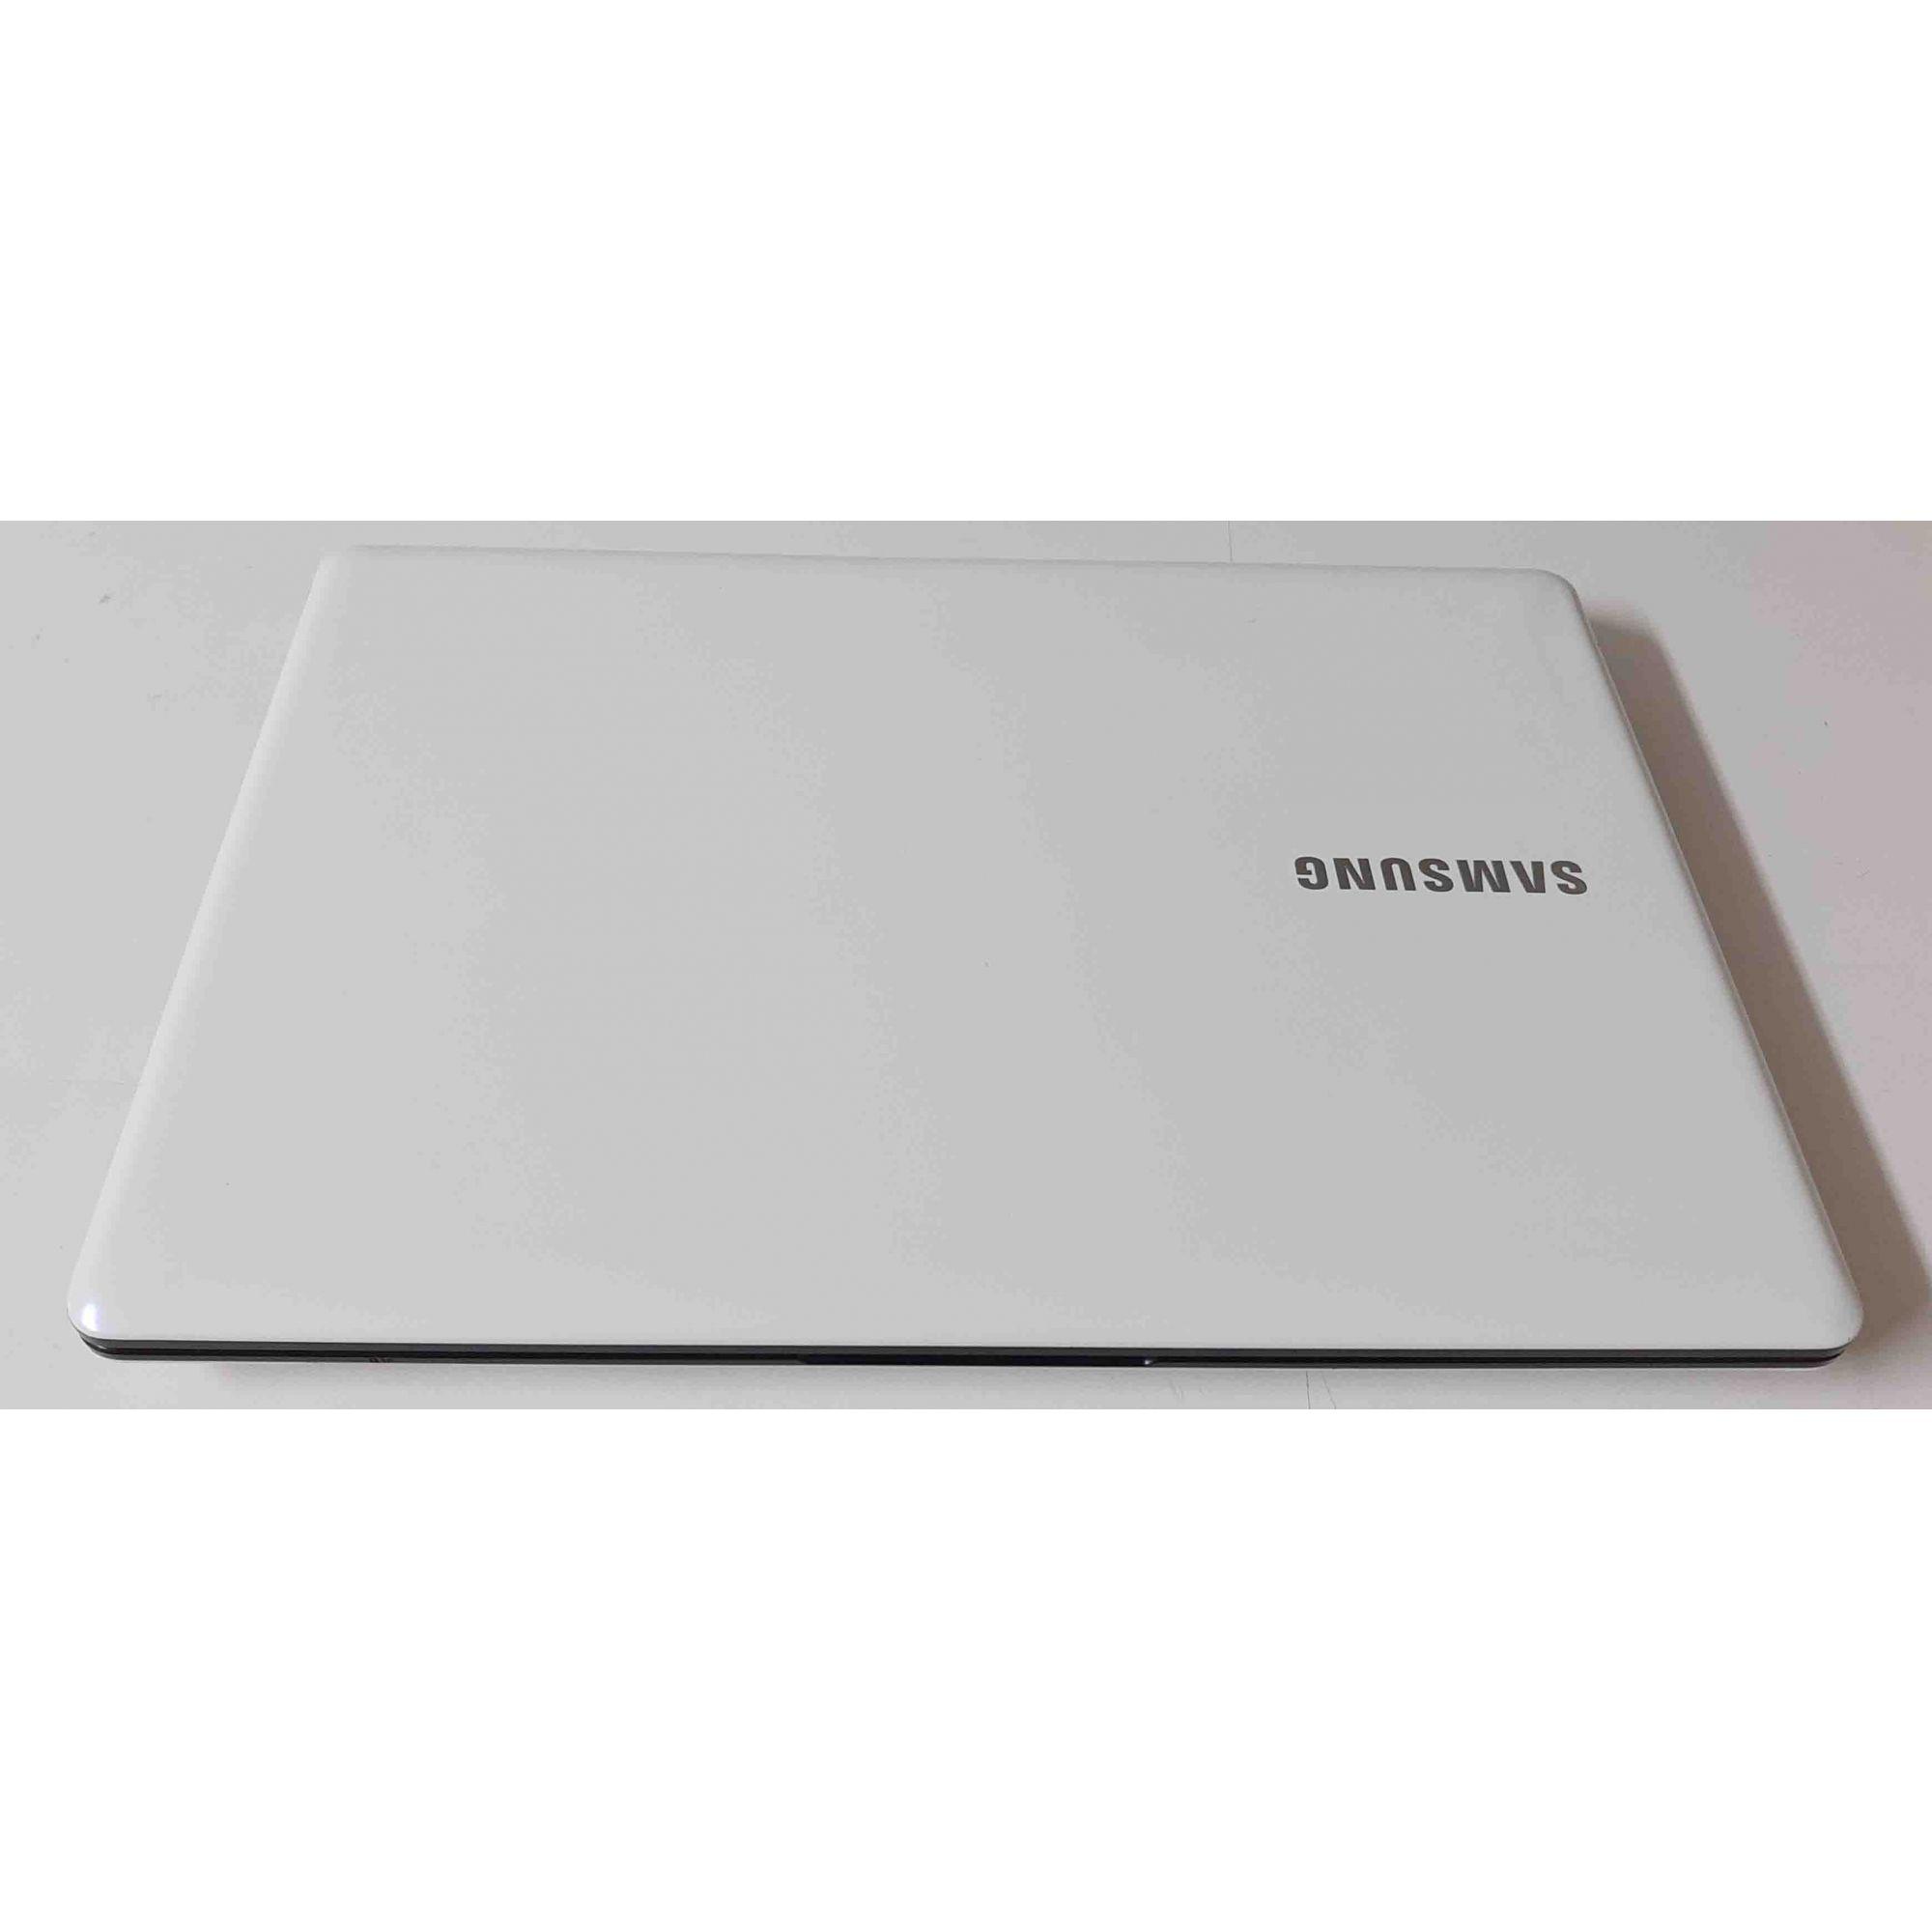 Notebook Samsung NP370E4K 14'' Intel Core i5 2.2GHz 4GB HD-500GB